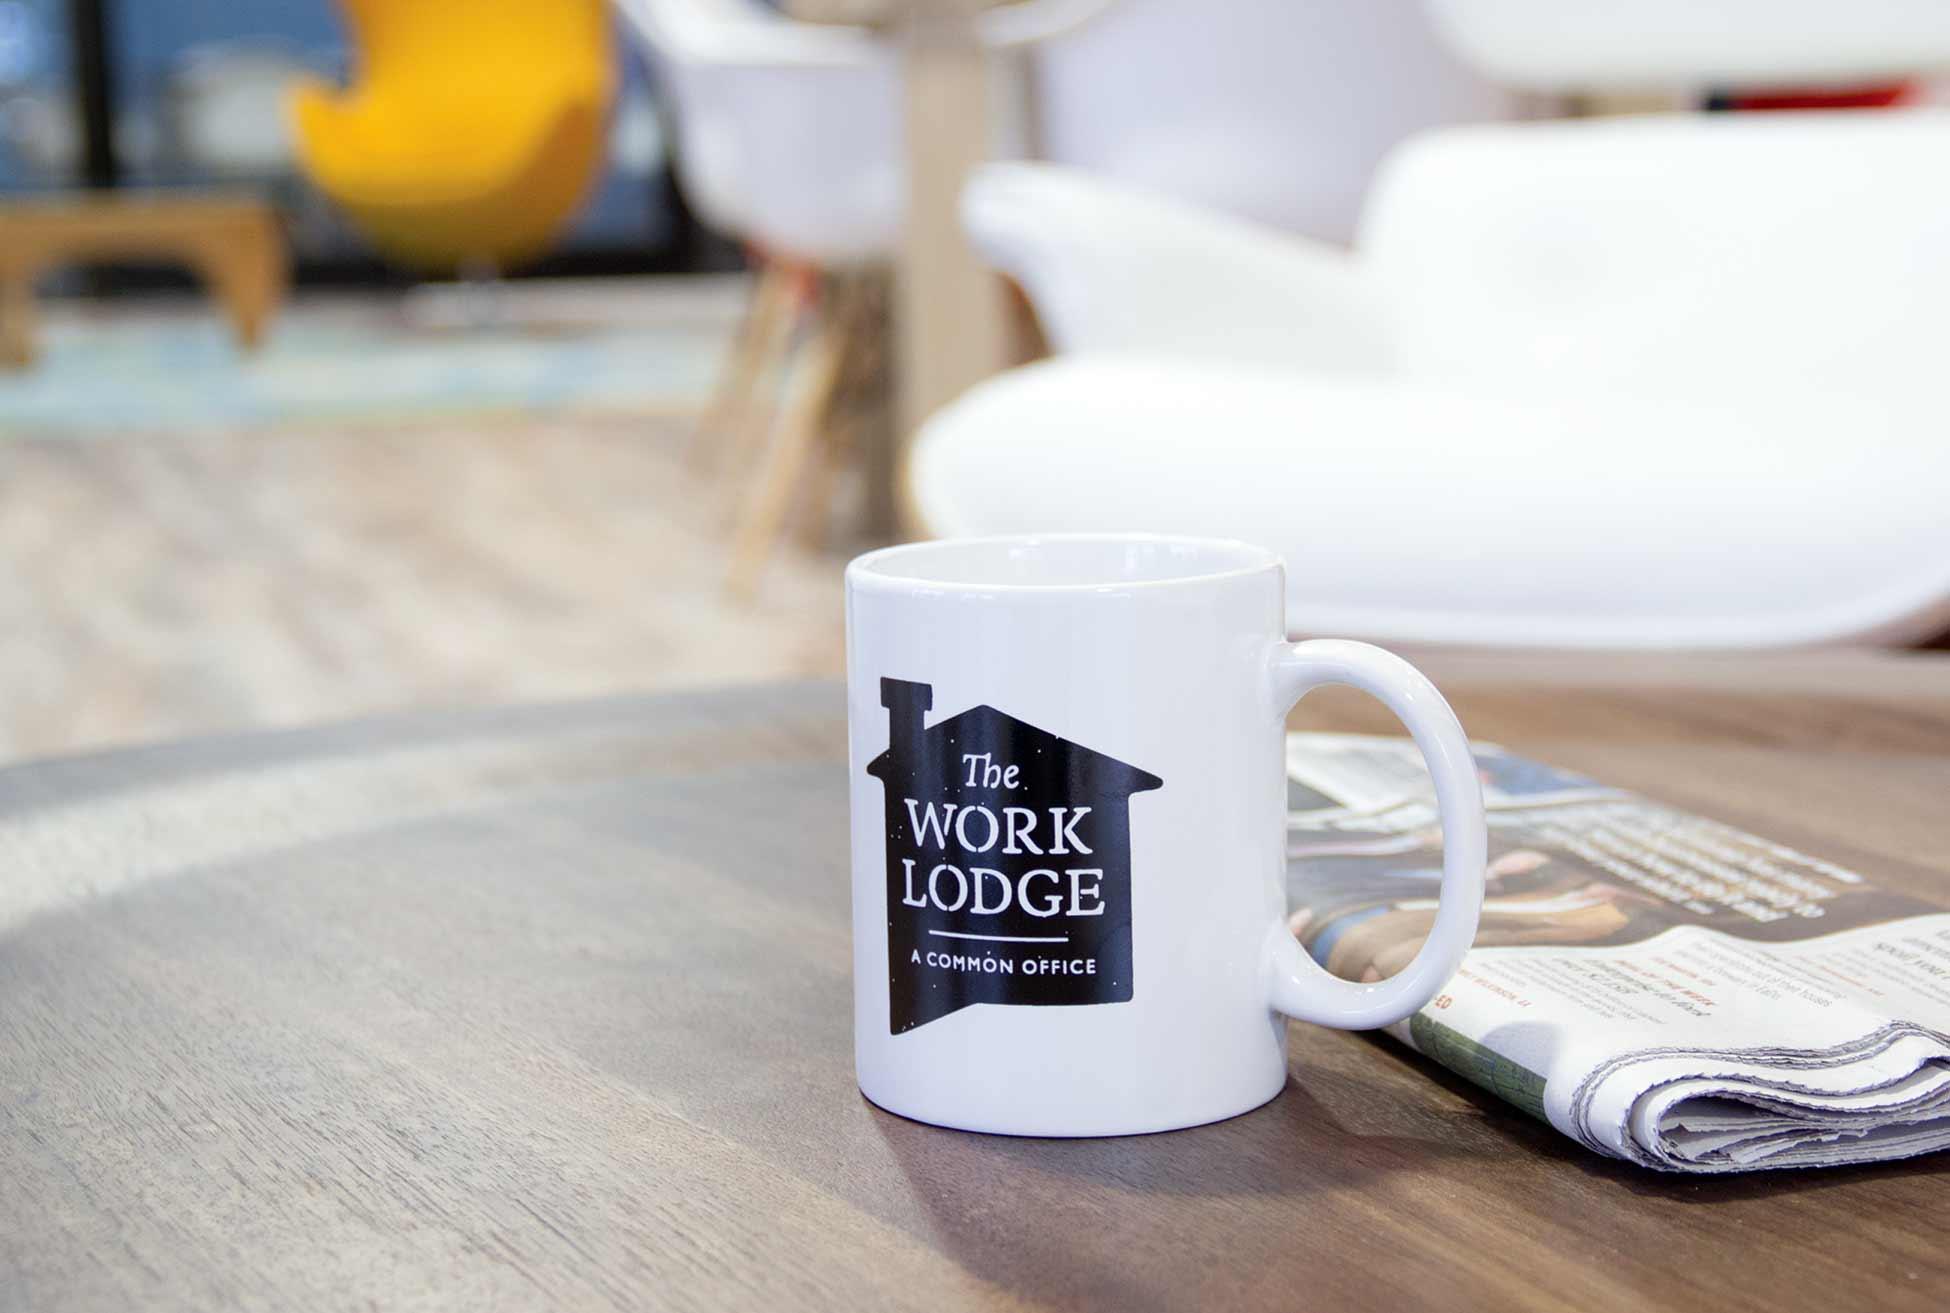 theworklodge_coffee-cup.jpg